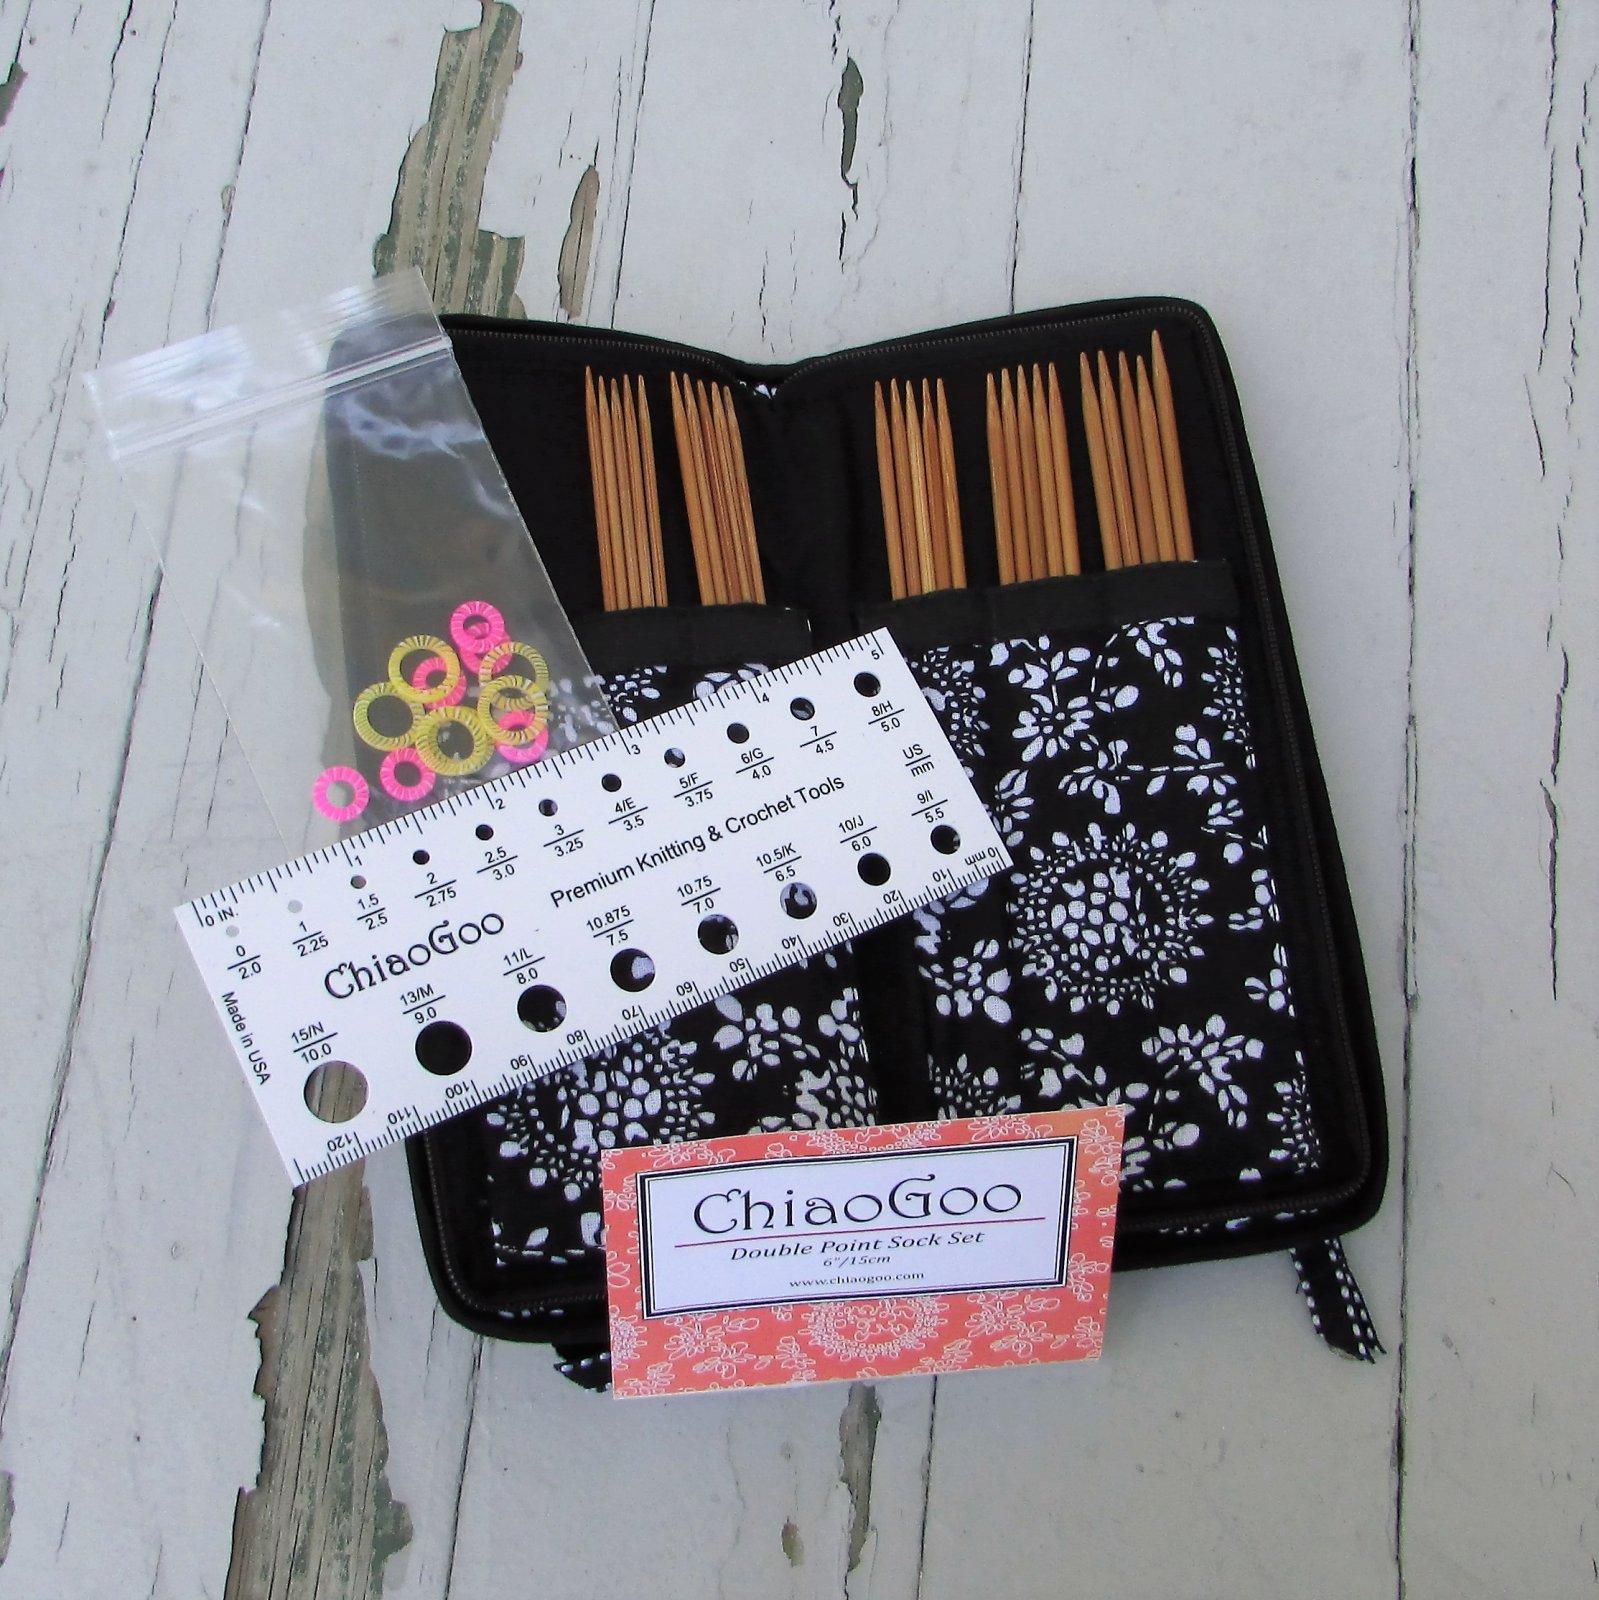 ChiaoGoo DPN Set Bamboo